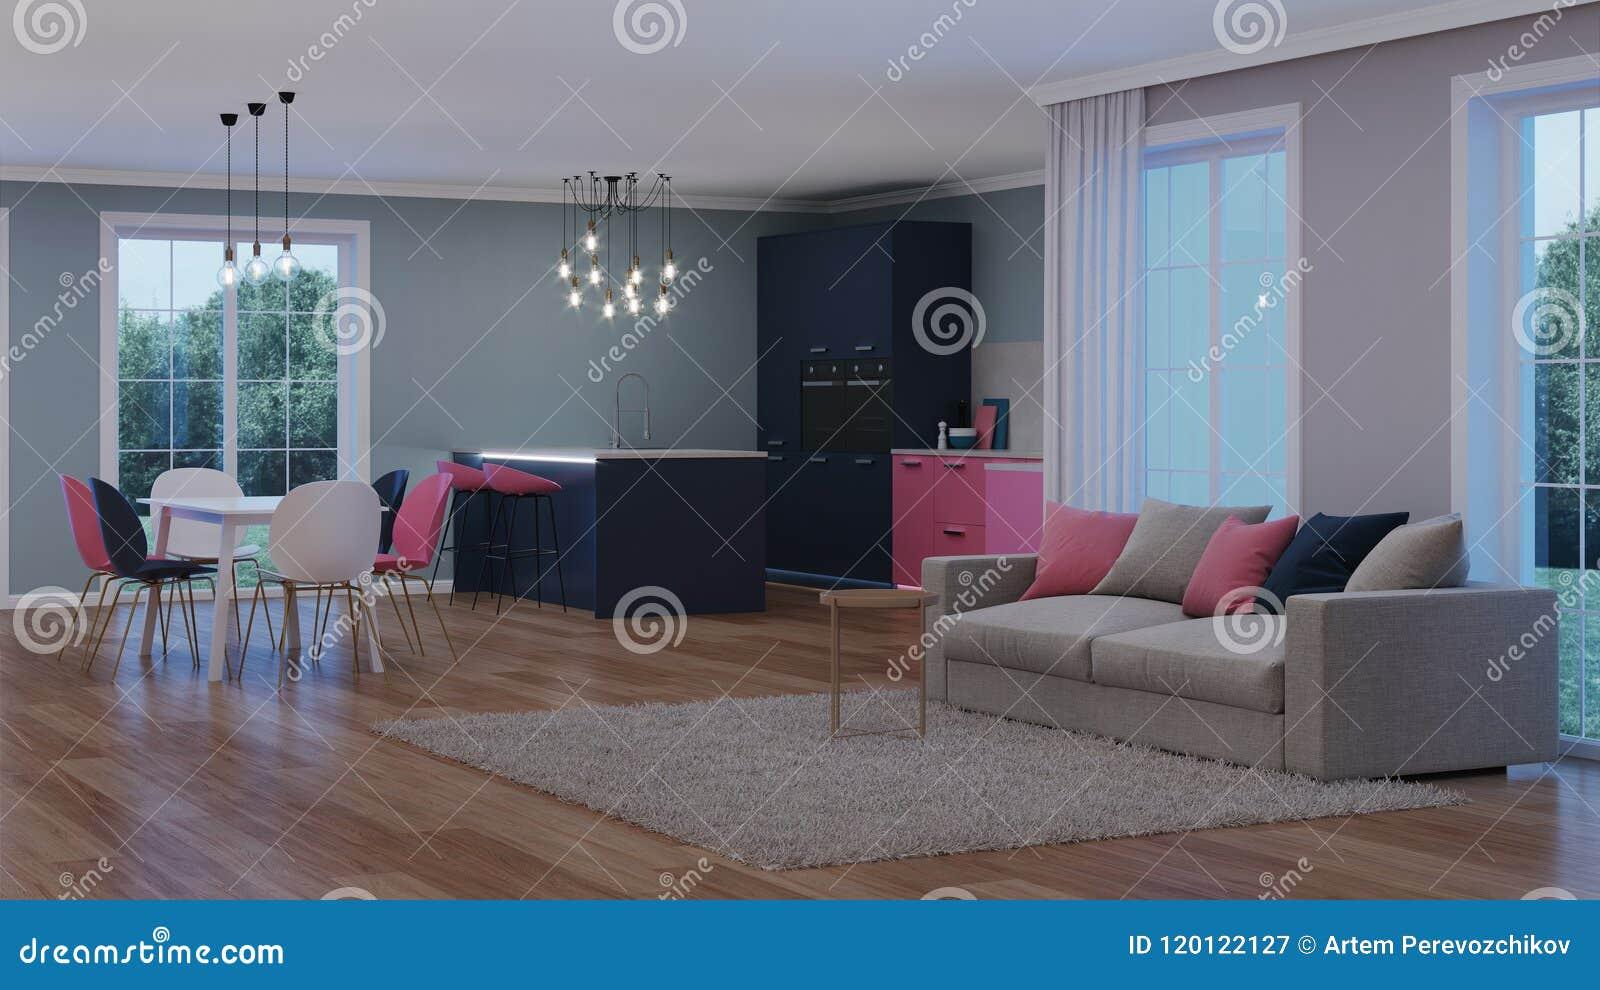 Modern house interior pink kitchen night evening lighting artificial light sources 3d rendering